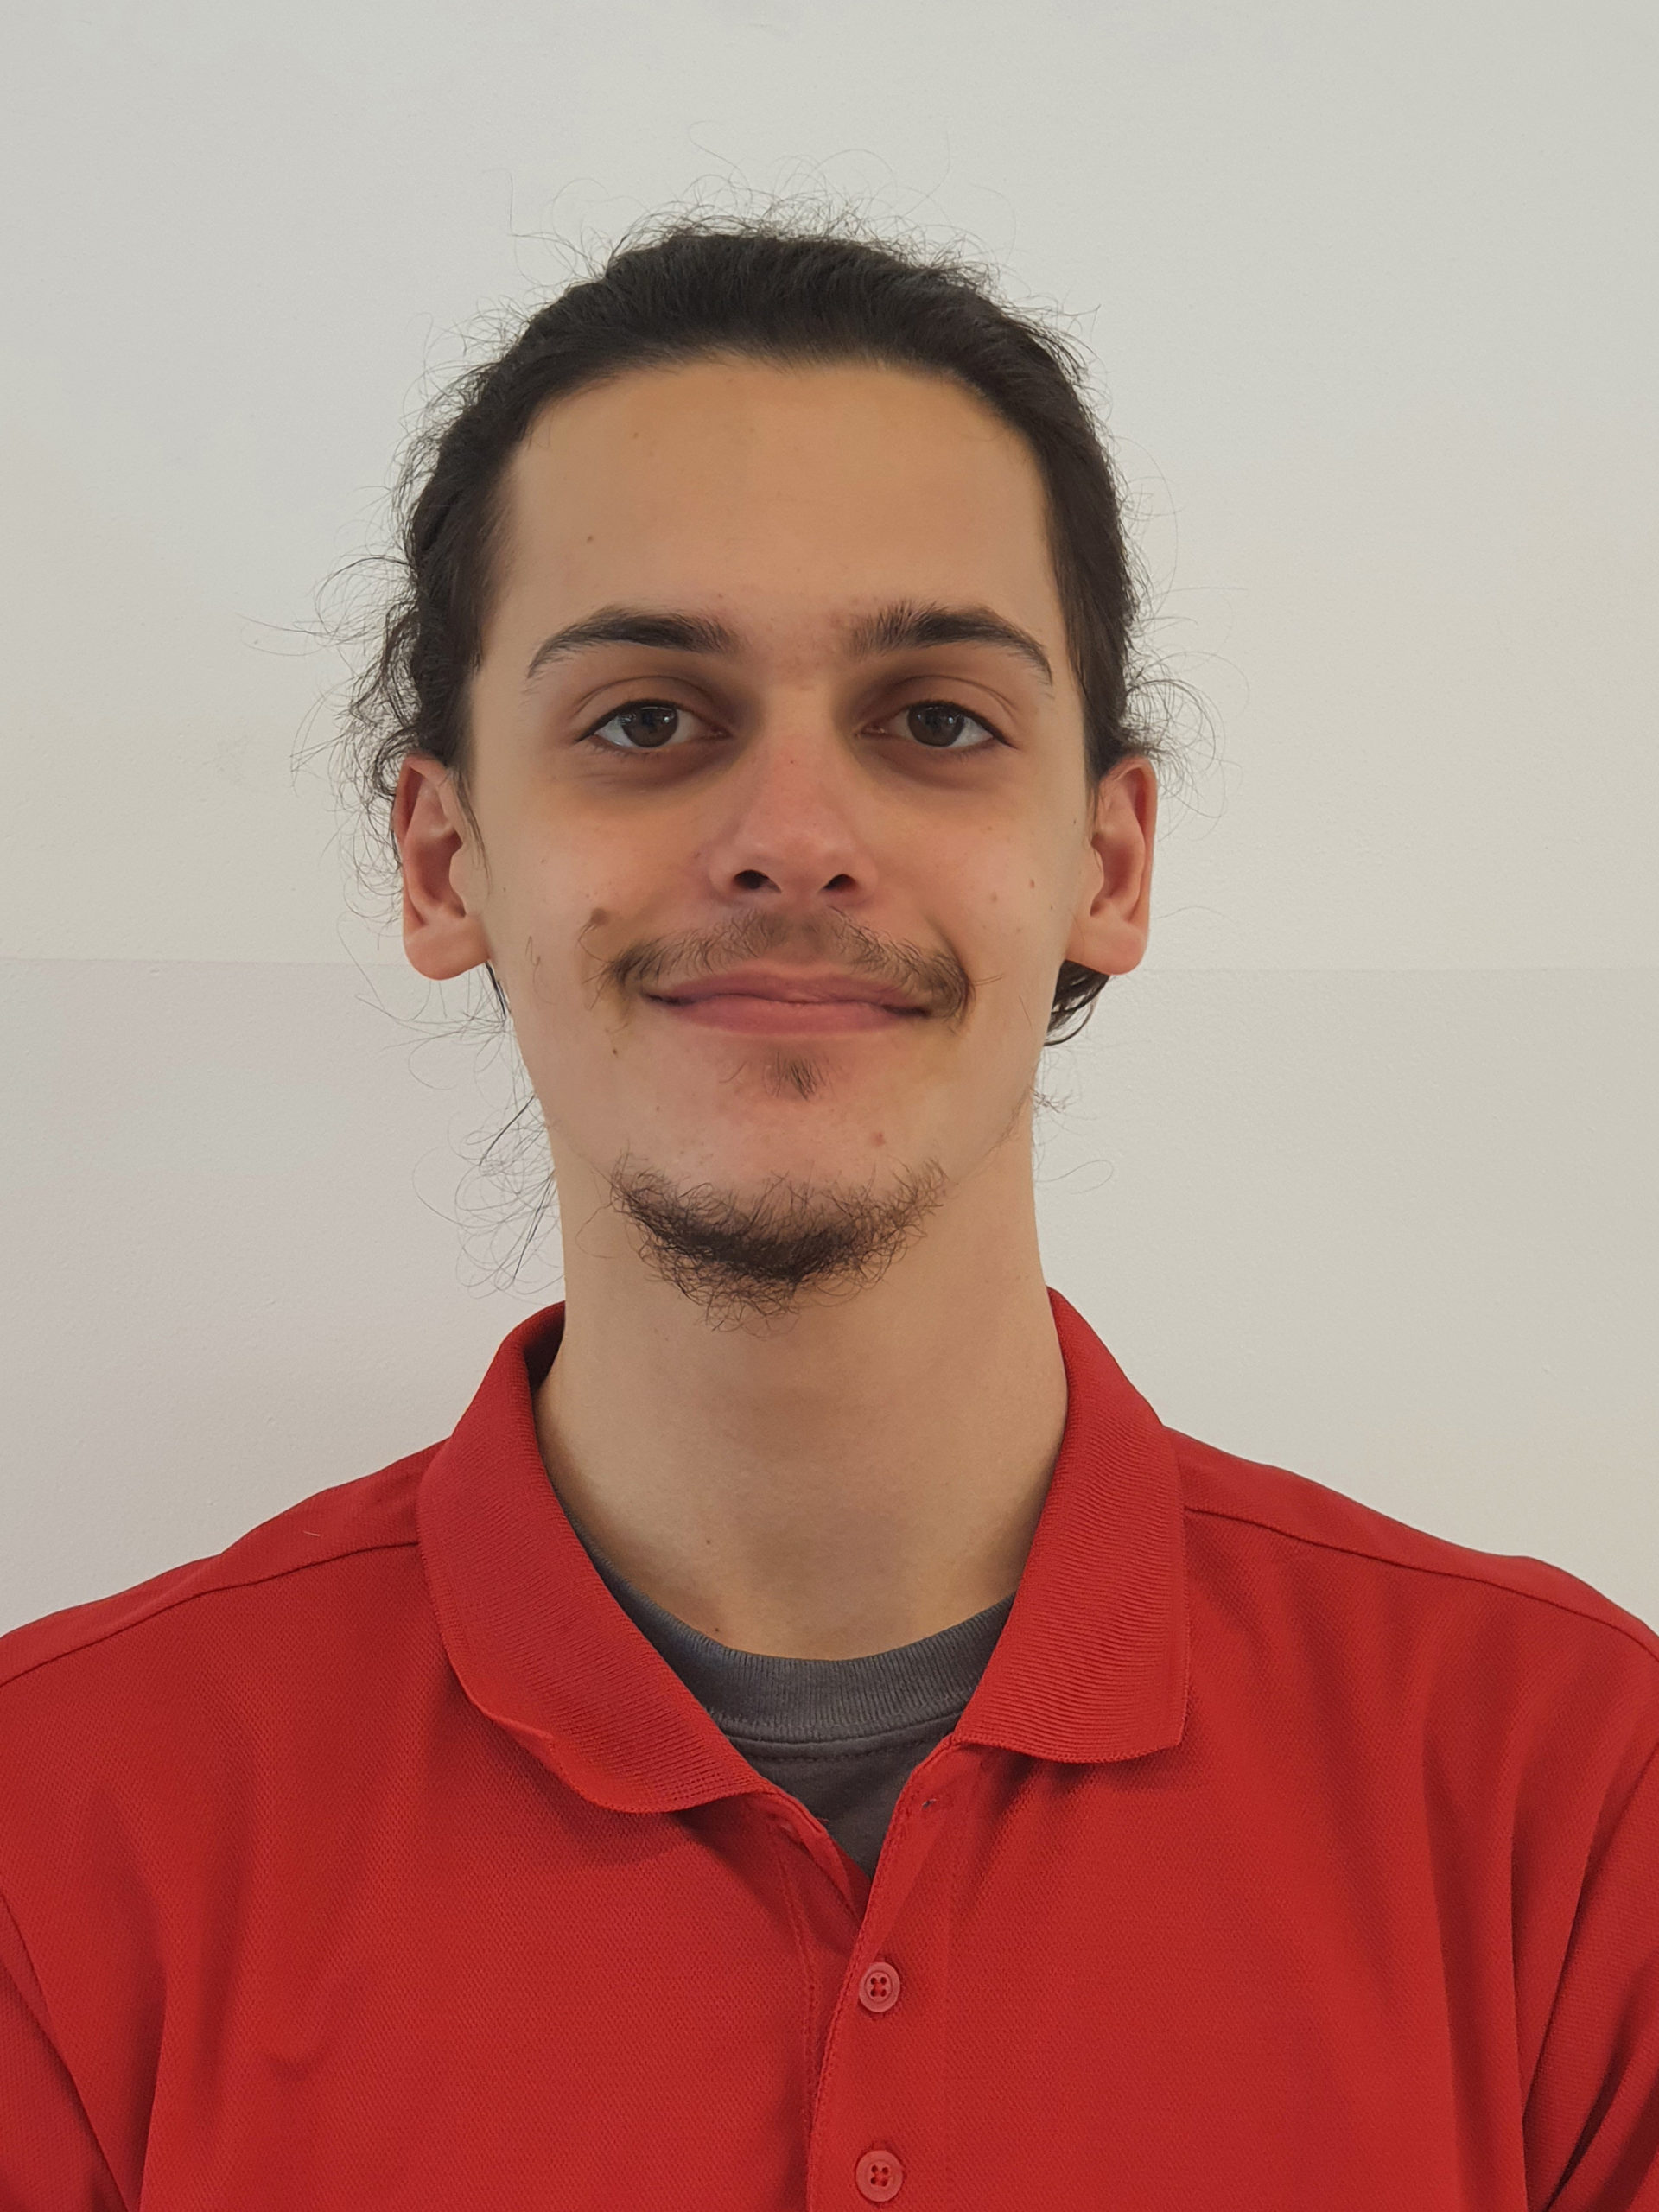 Deyan Alojevic